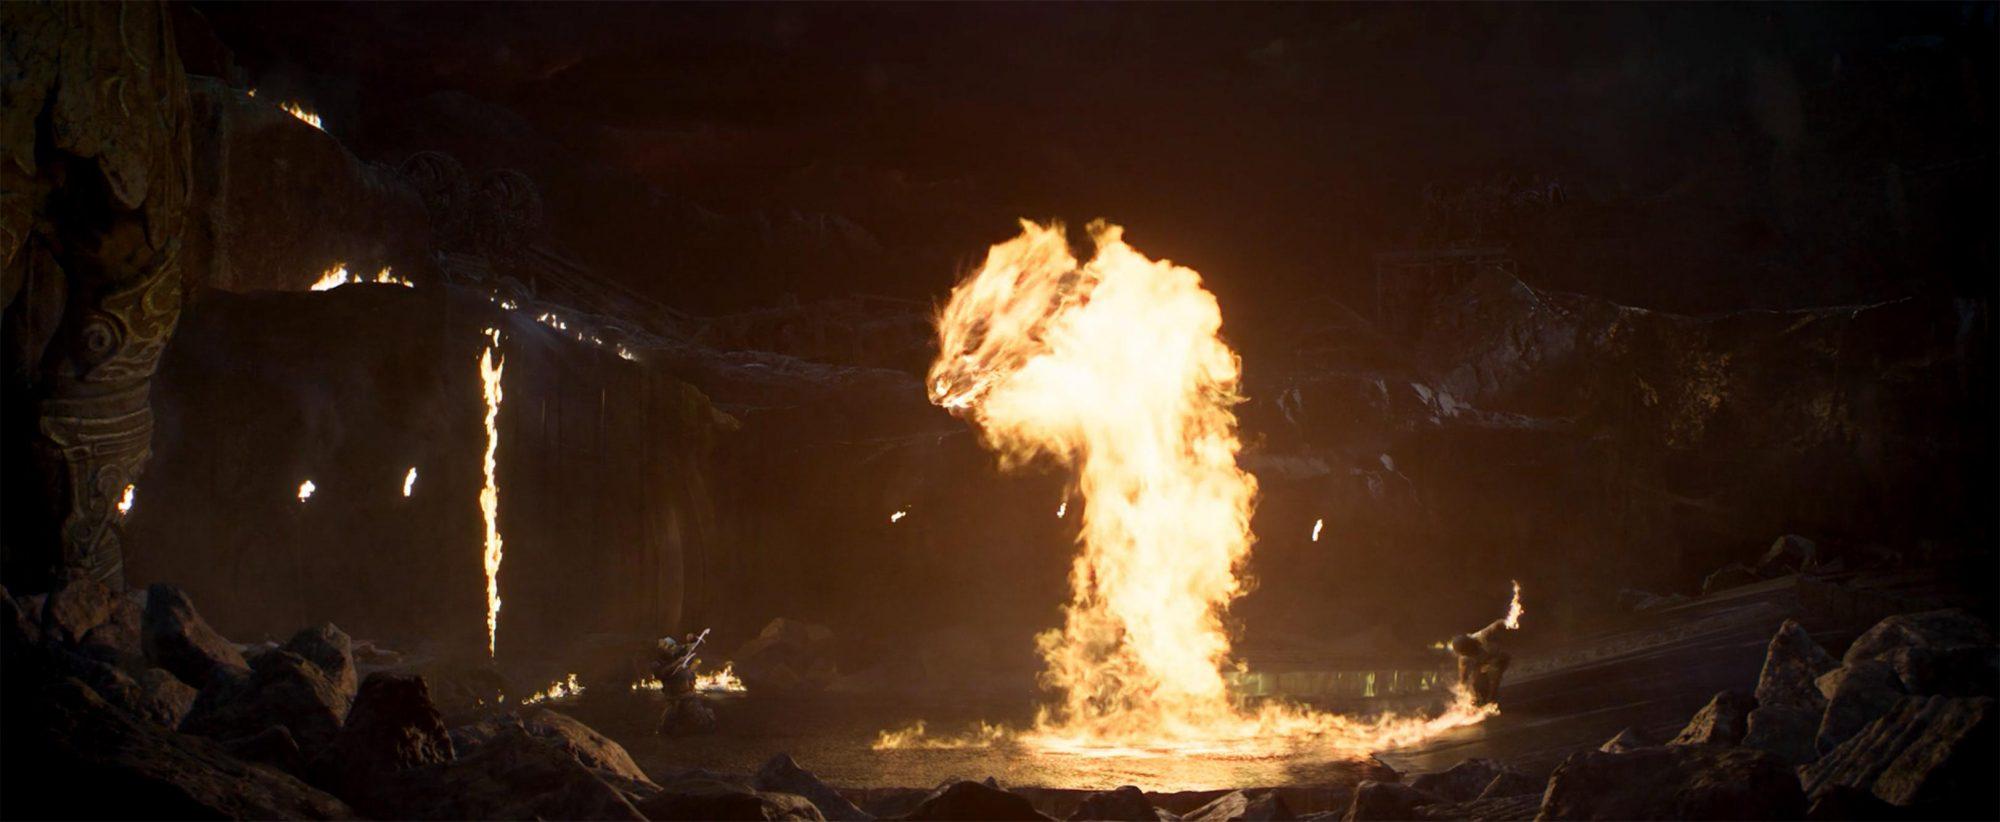 Mortal Kombat trailer